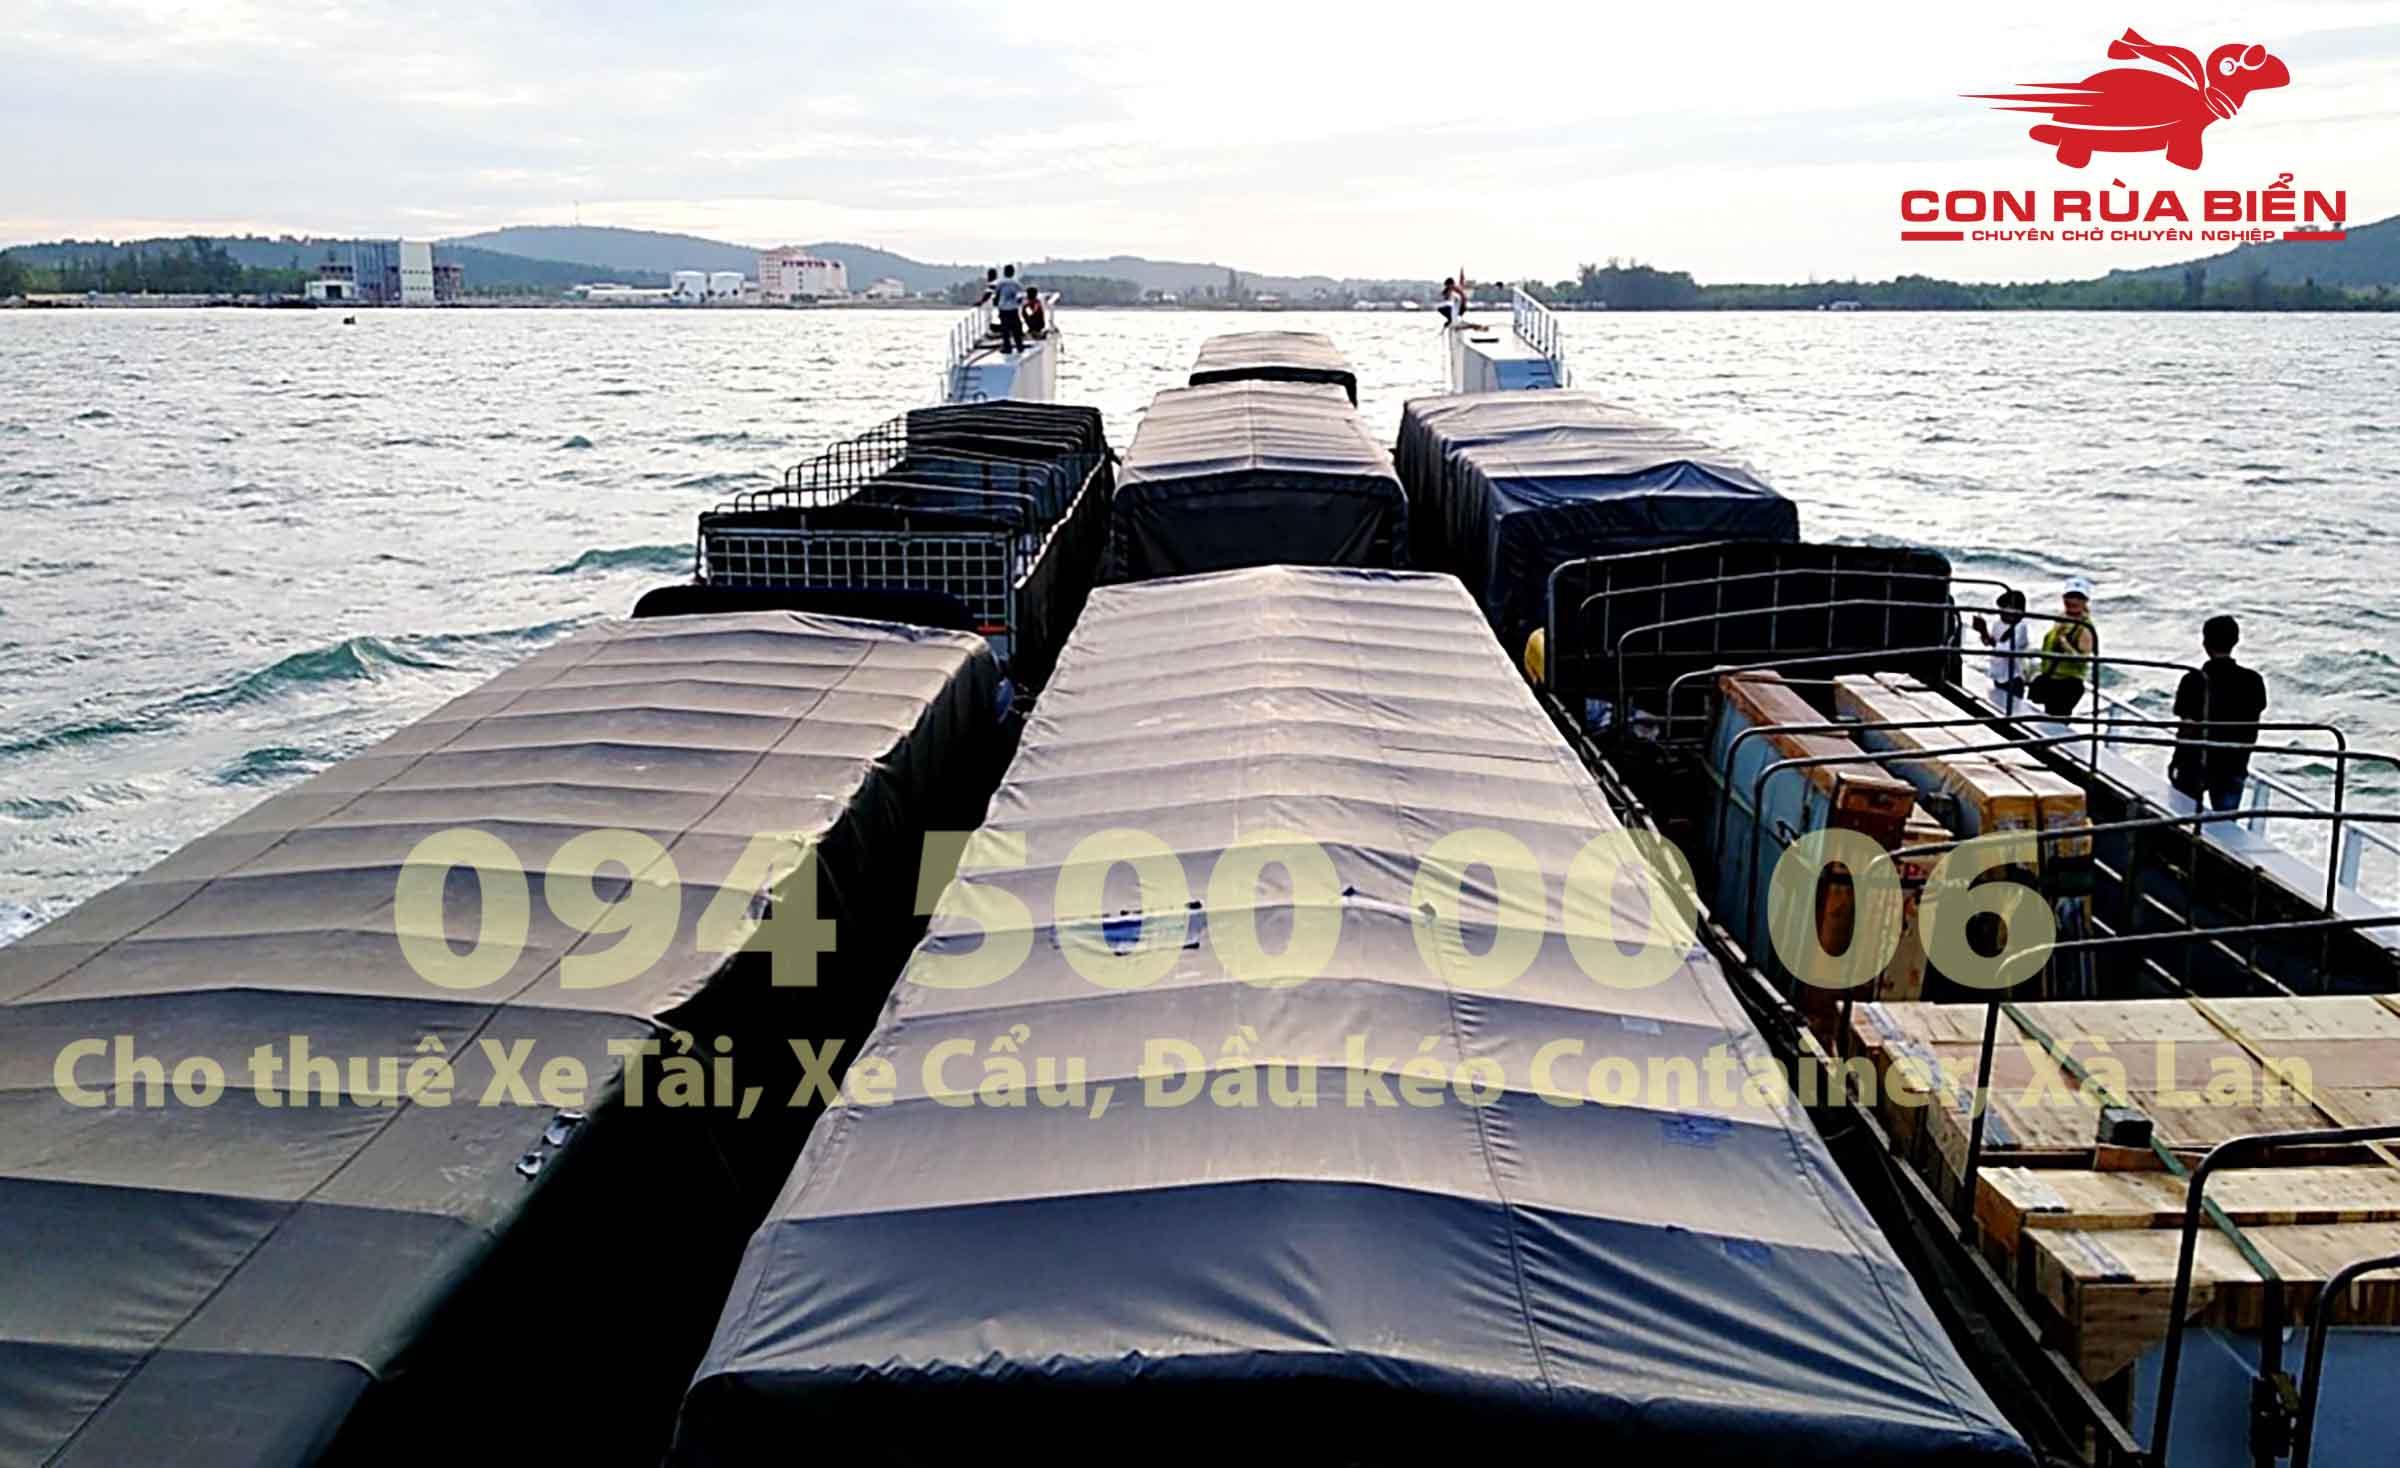 Cho thue Pha cho xe tai xe container di Hon Thom Phu Quoc 9